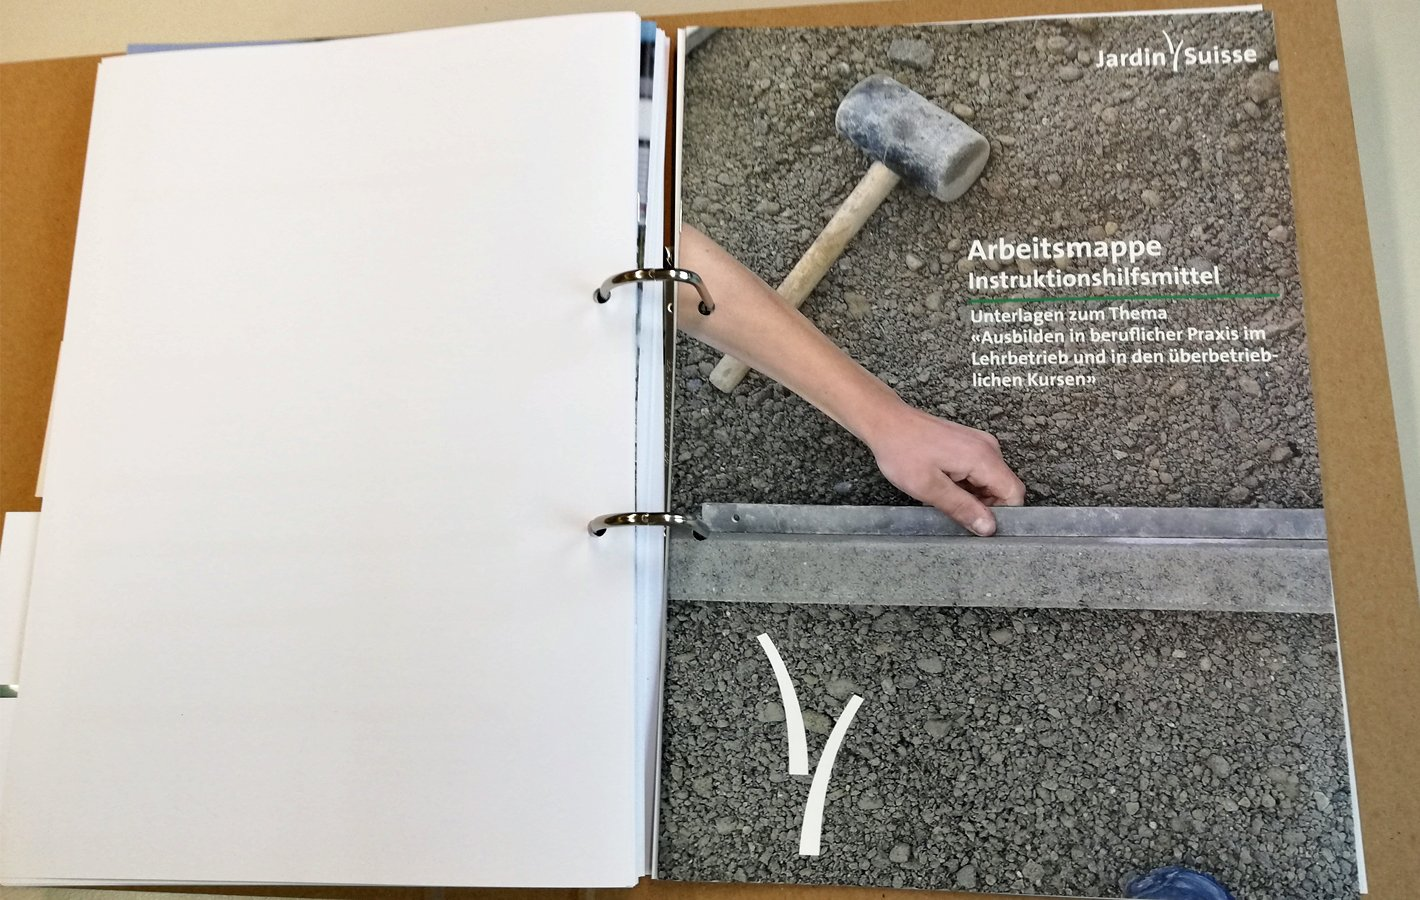 Ausbildungsdossier inkl. Instruktionshilfsmittel